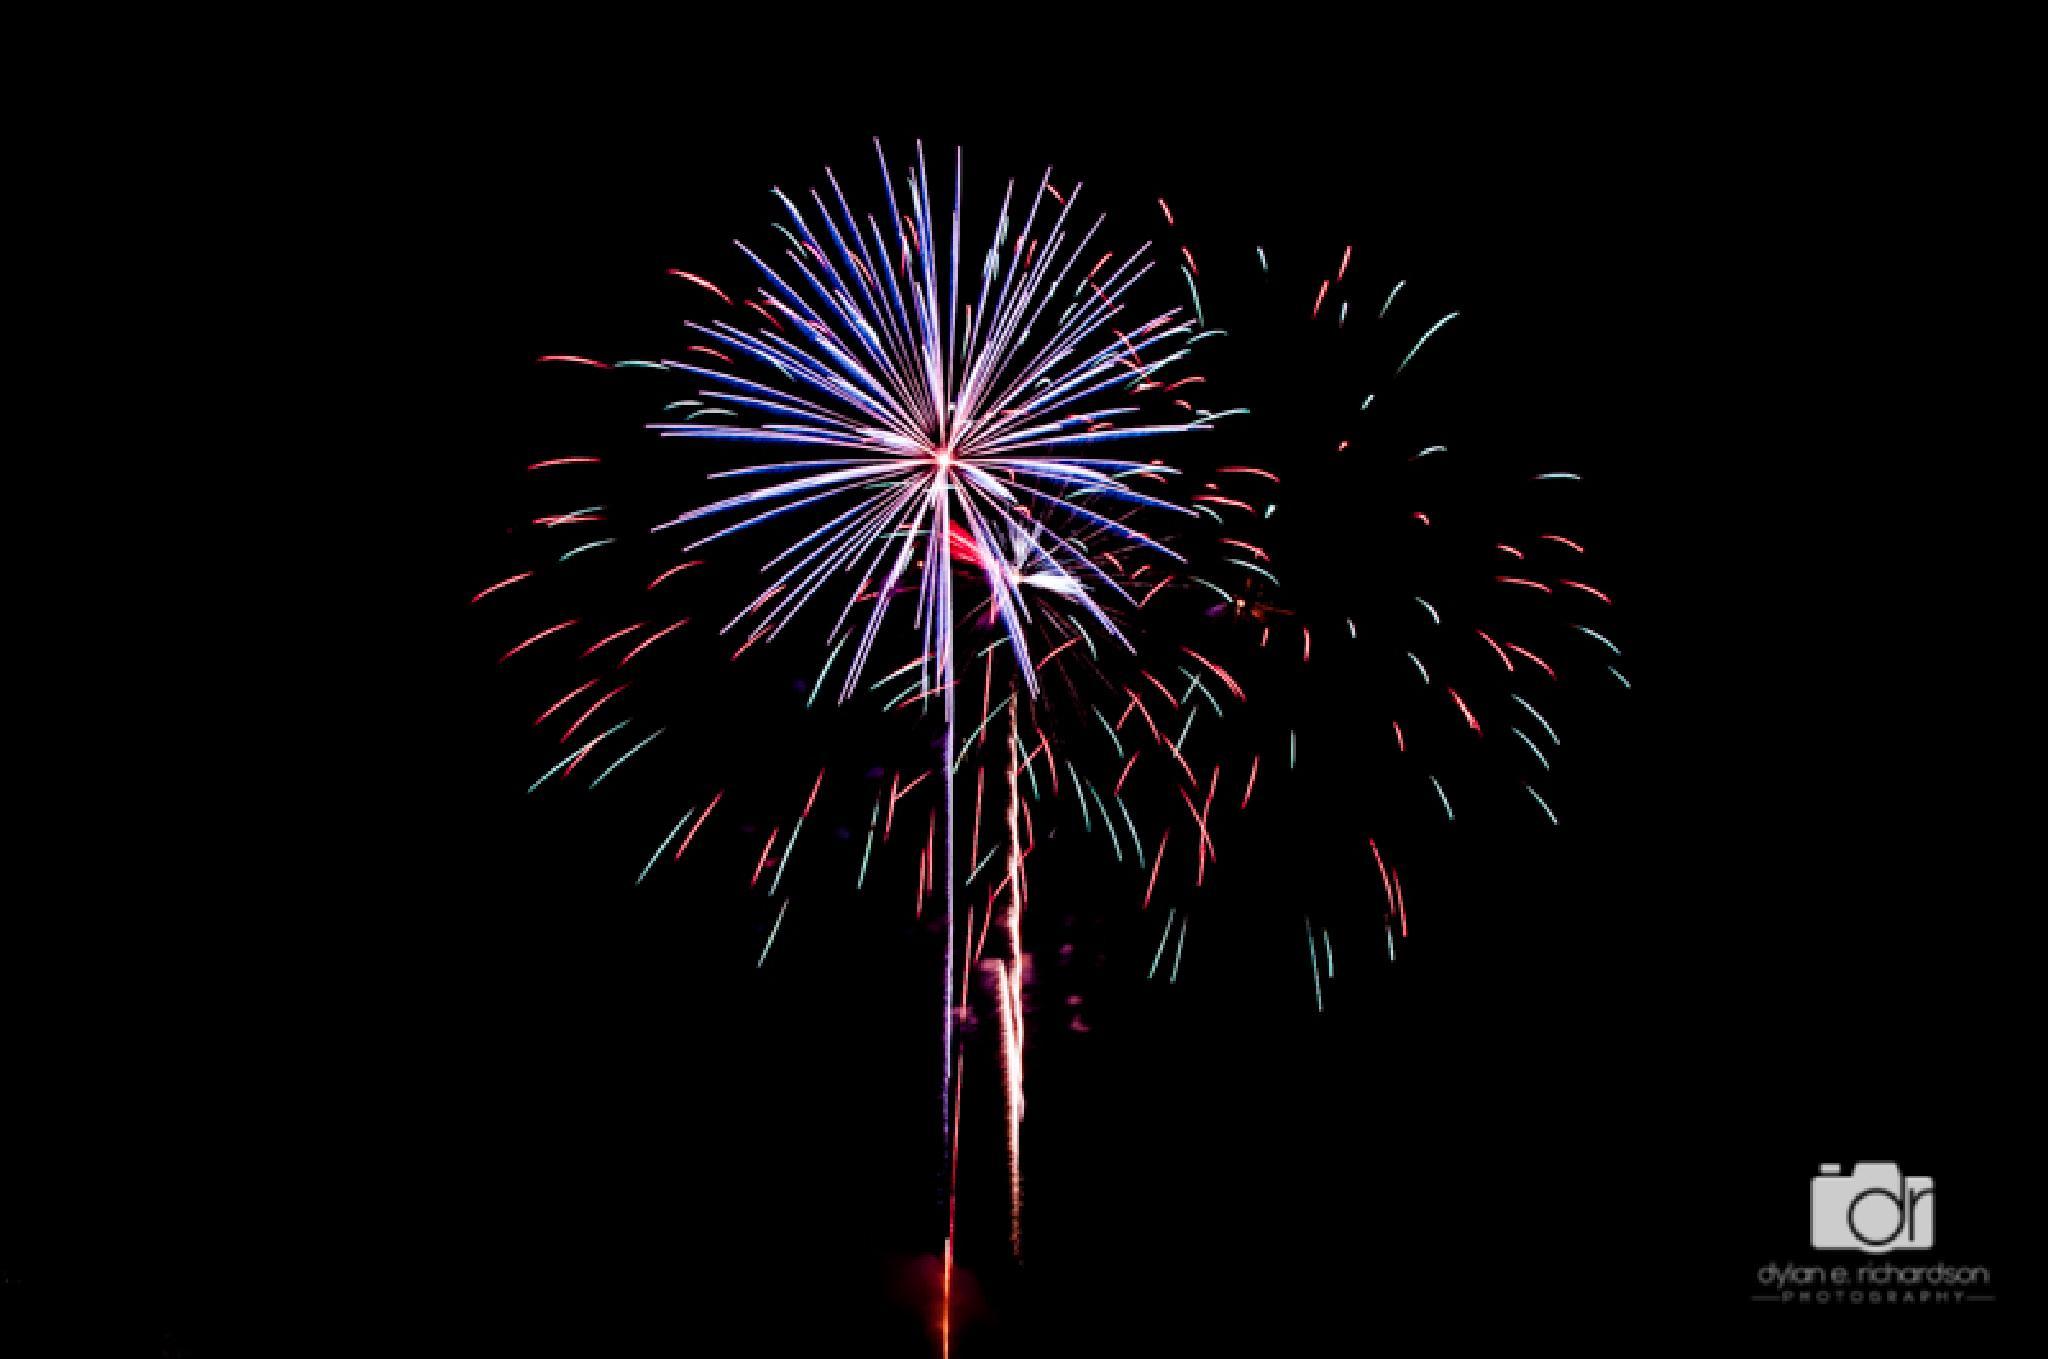 Fireworks 2274 by dronline841